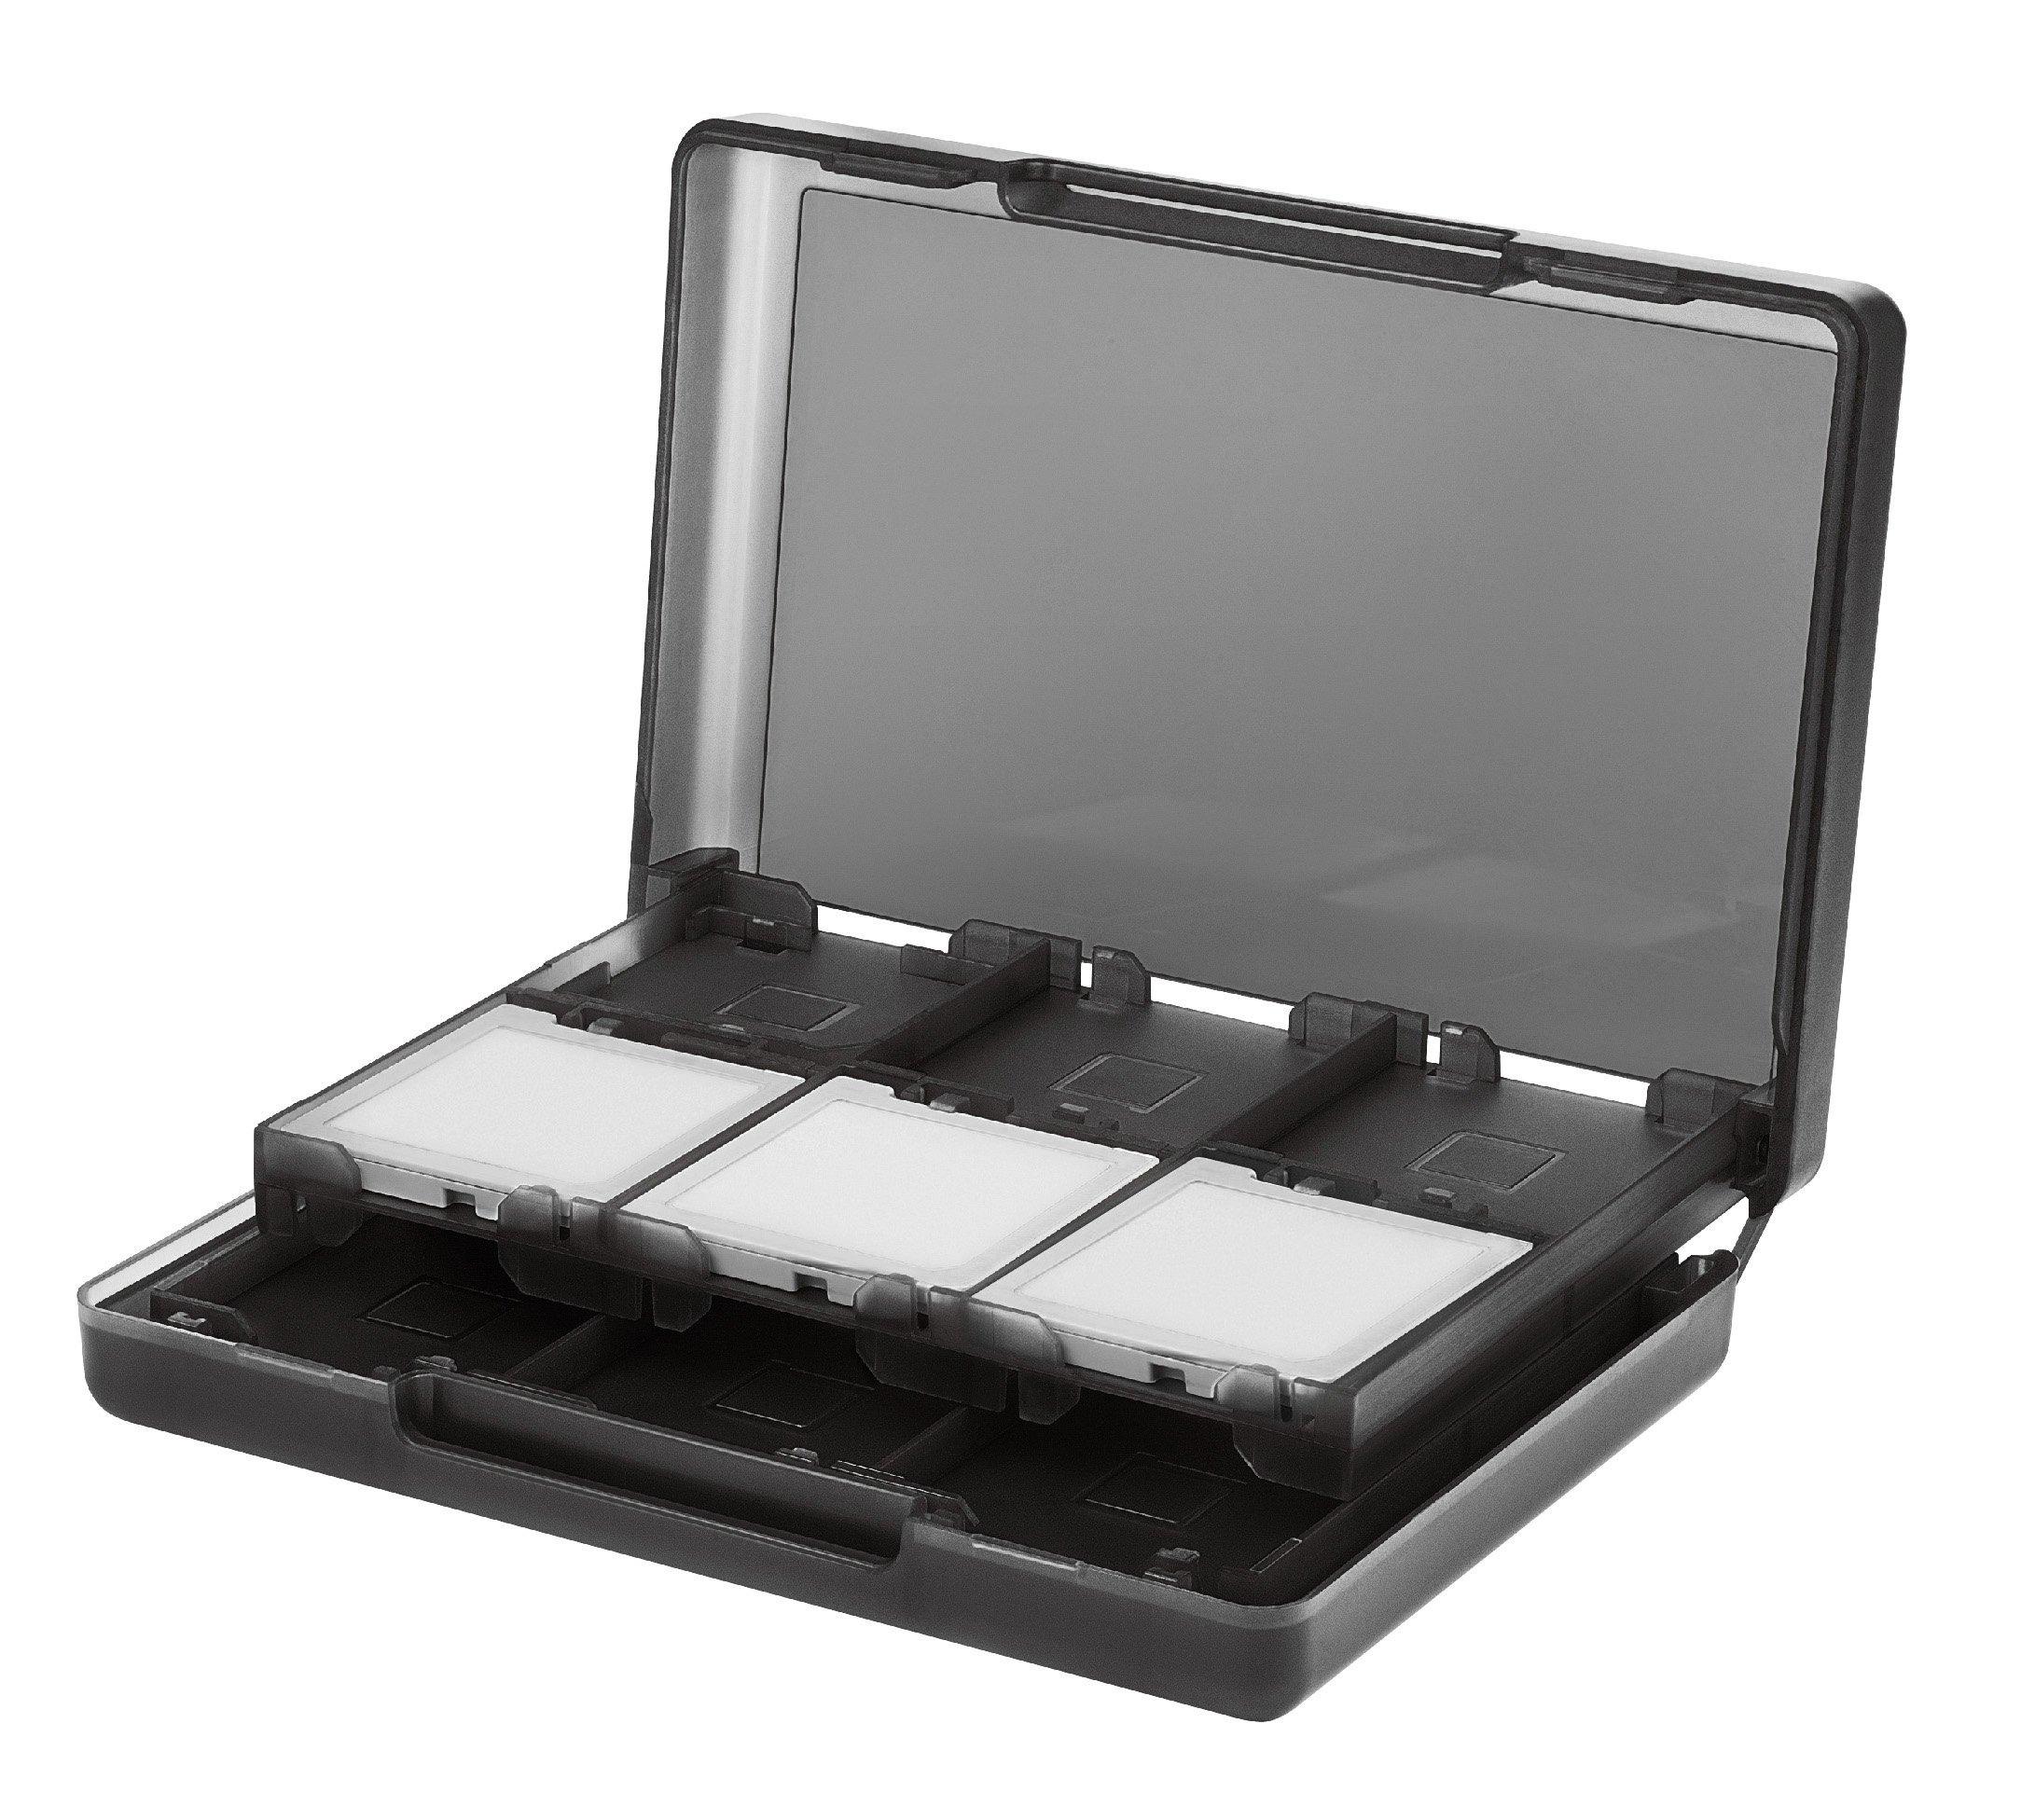 Amazon Basics Nintendo 3DS Game Card Storage Case Holder with 24 Cartridge Slots - 3 x 5 x 1 Inches, Black